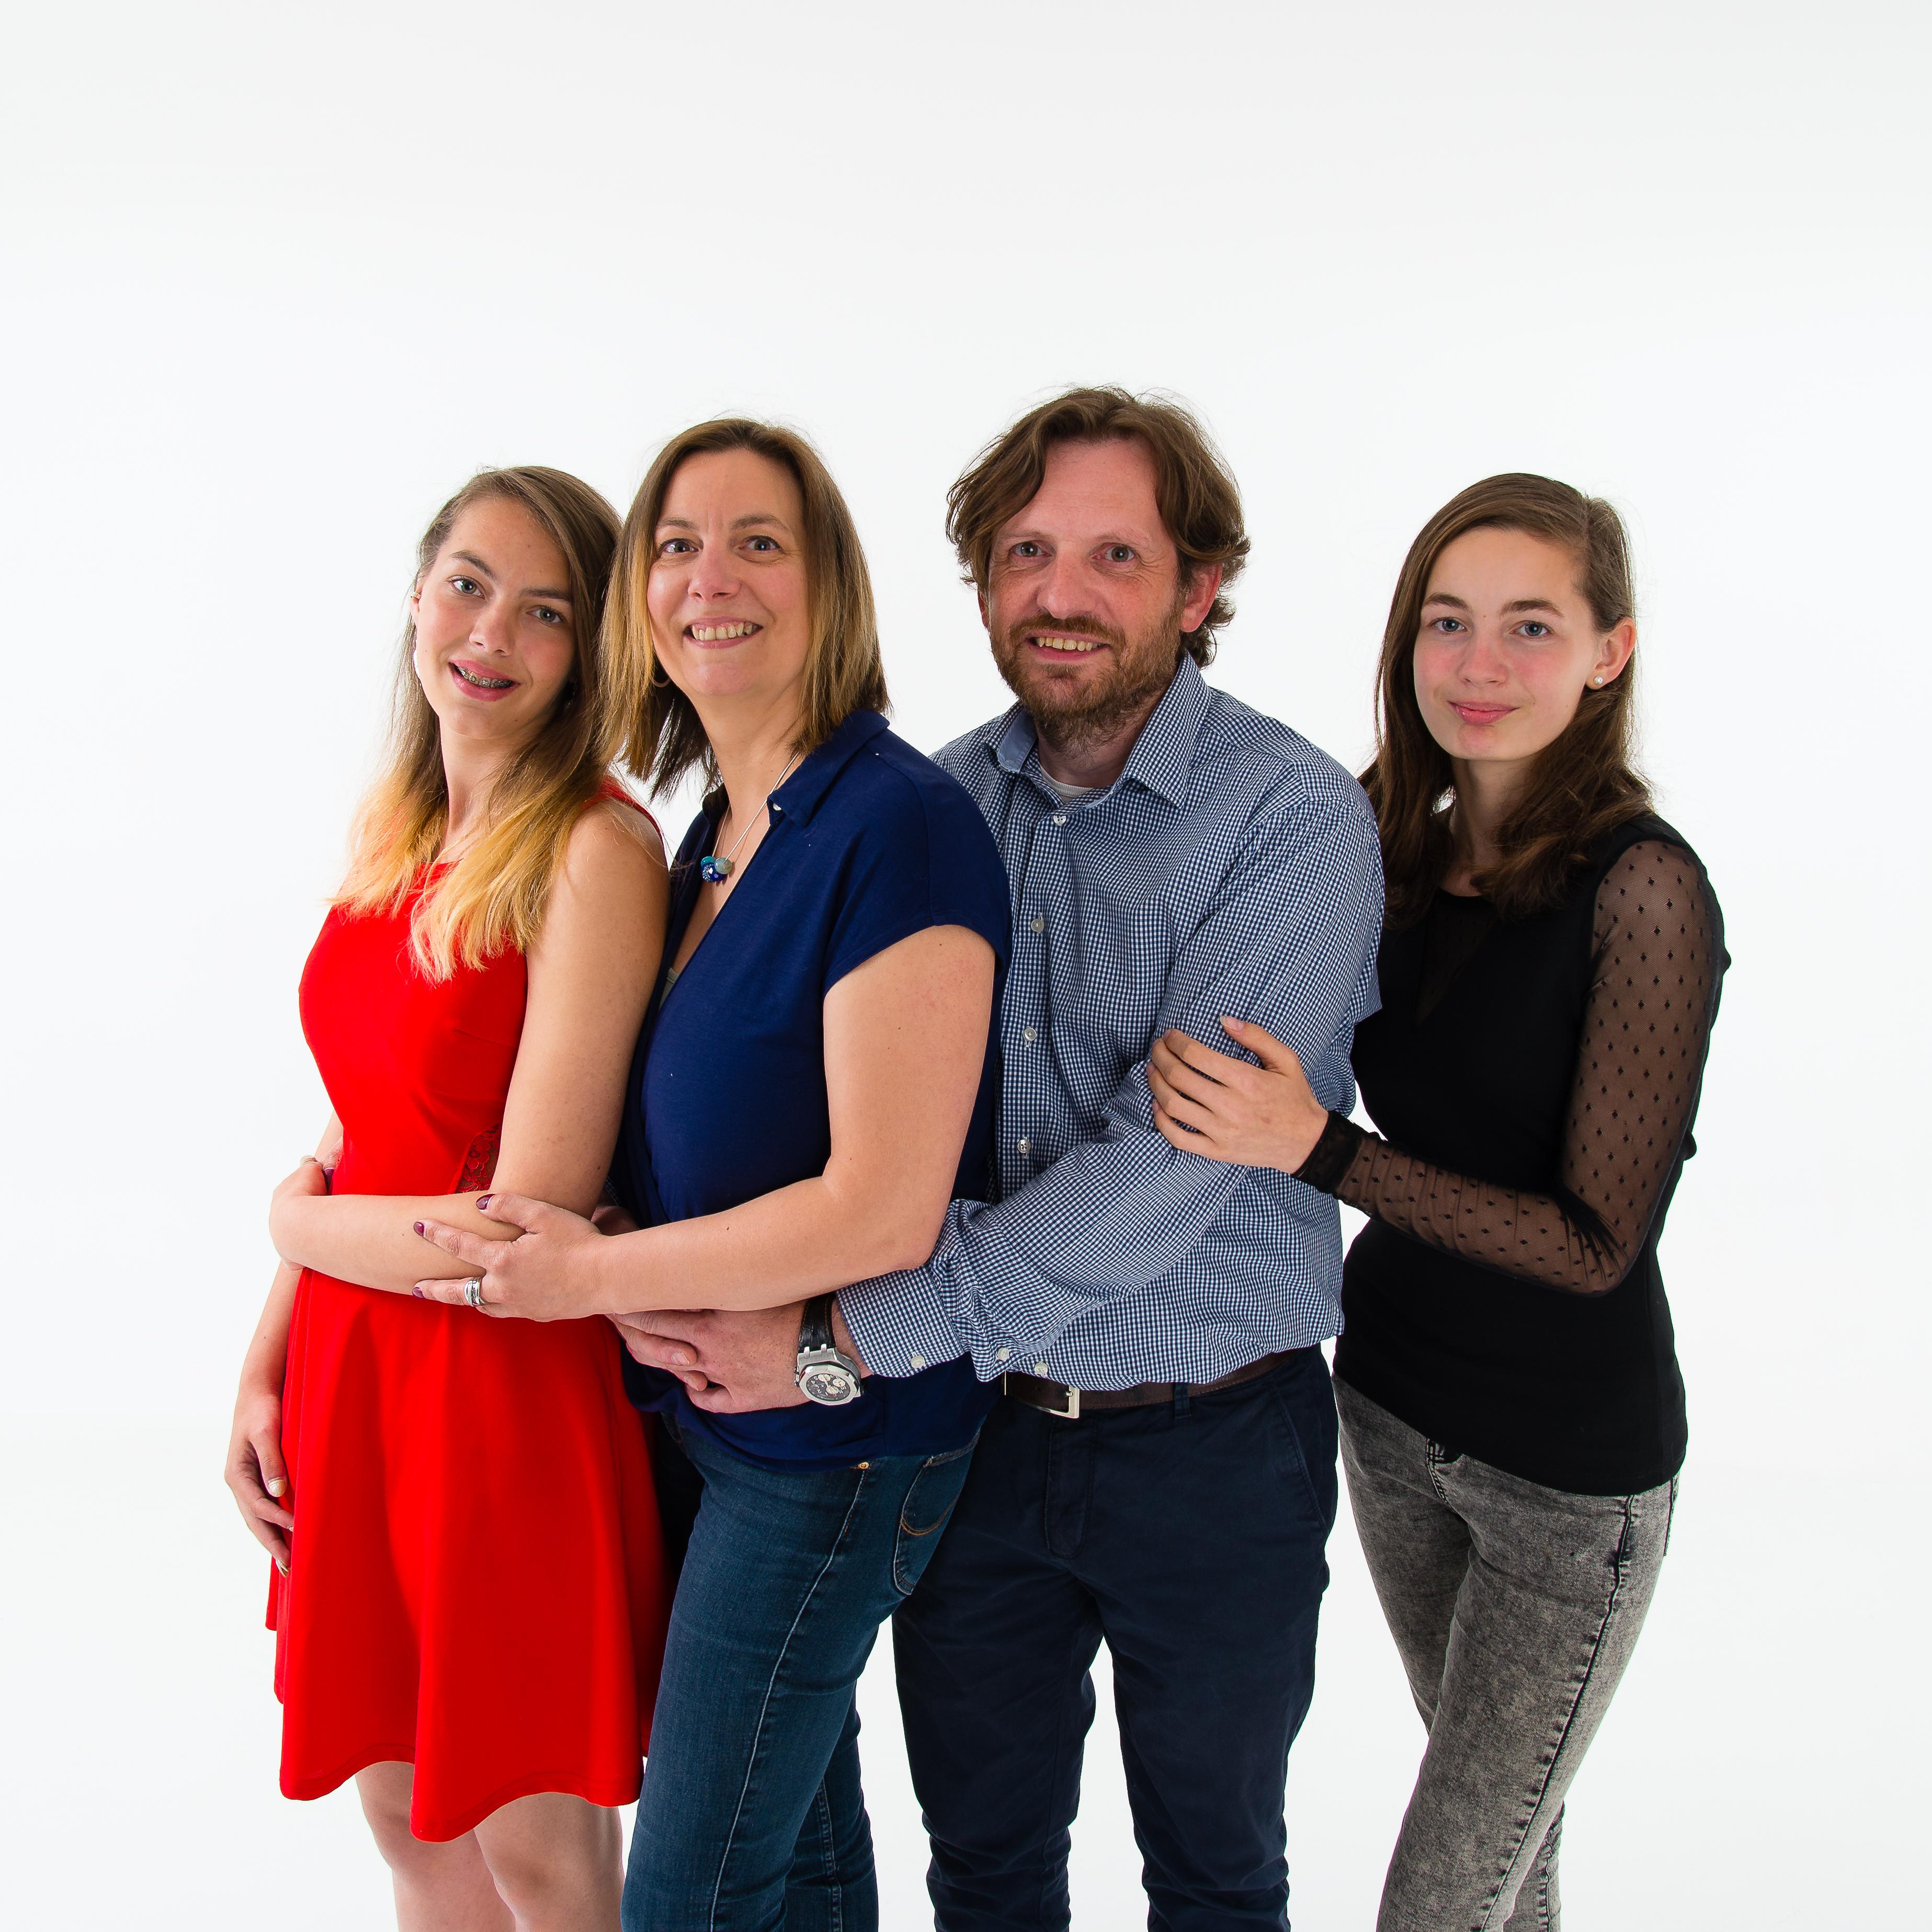 Familie fotoshoot-26